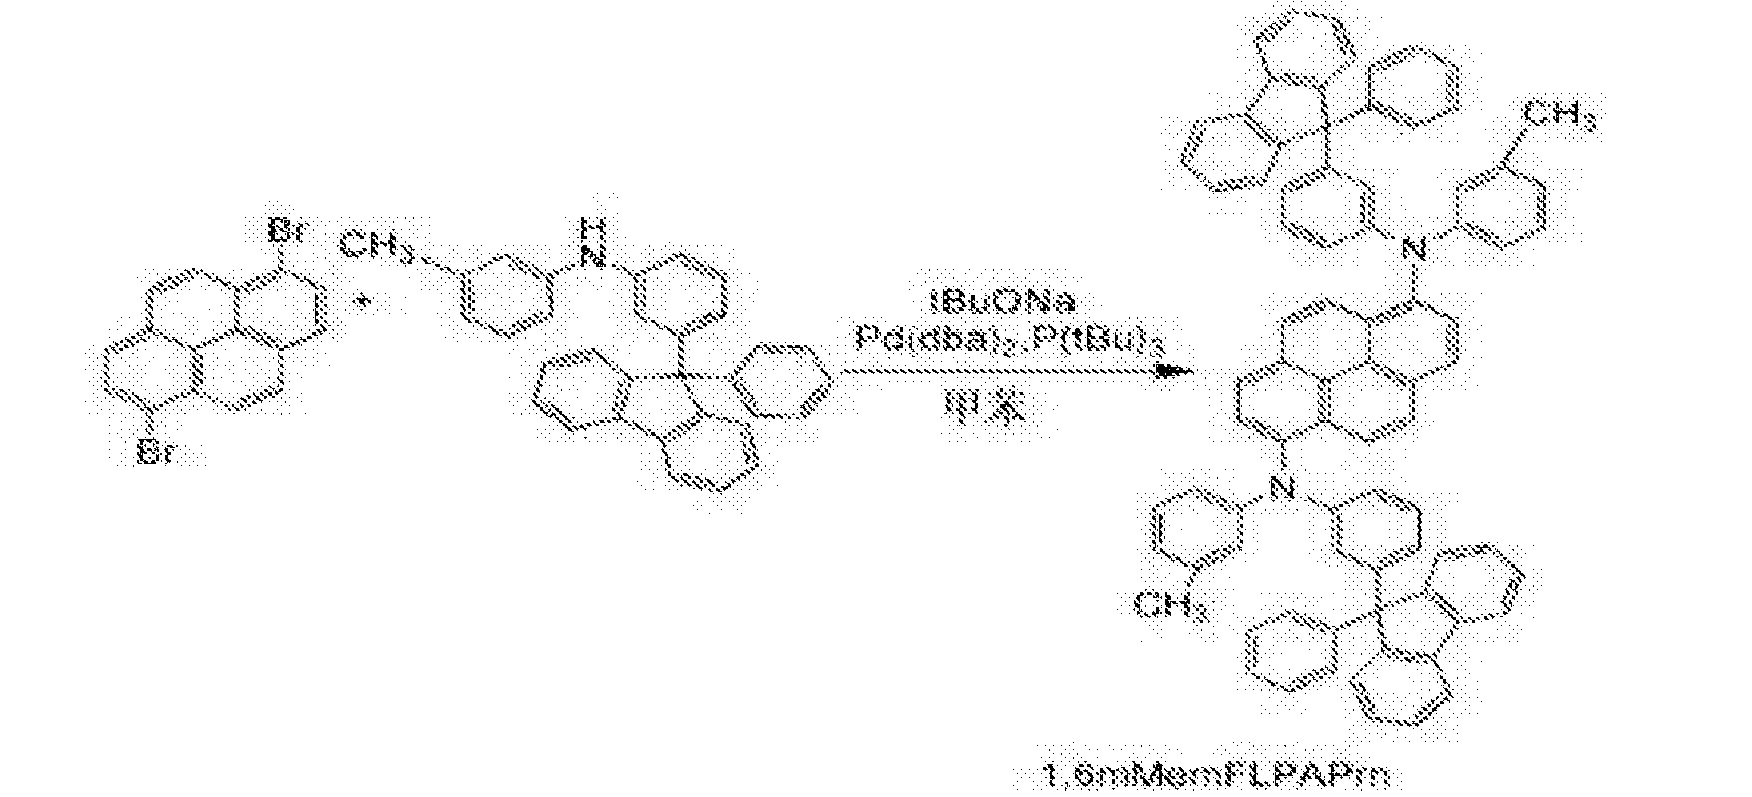 Figure CN106187859AD00631